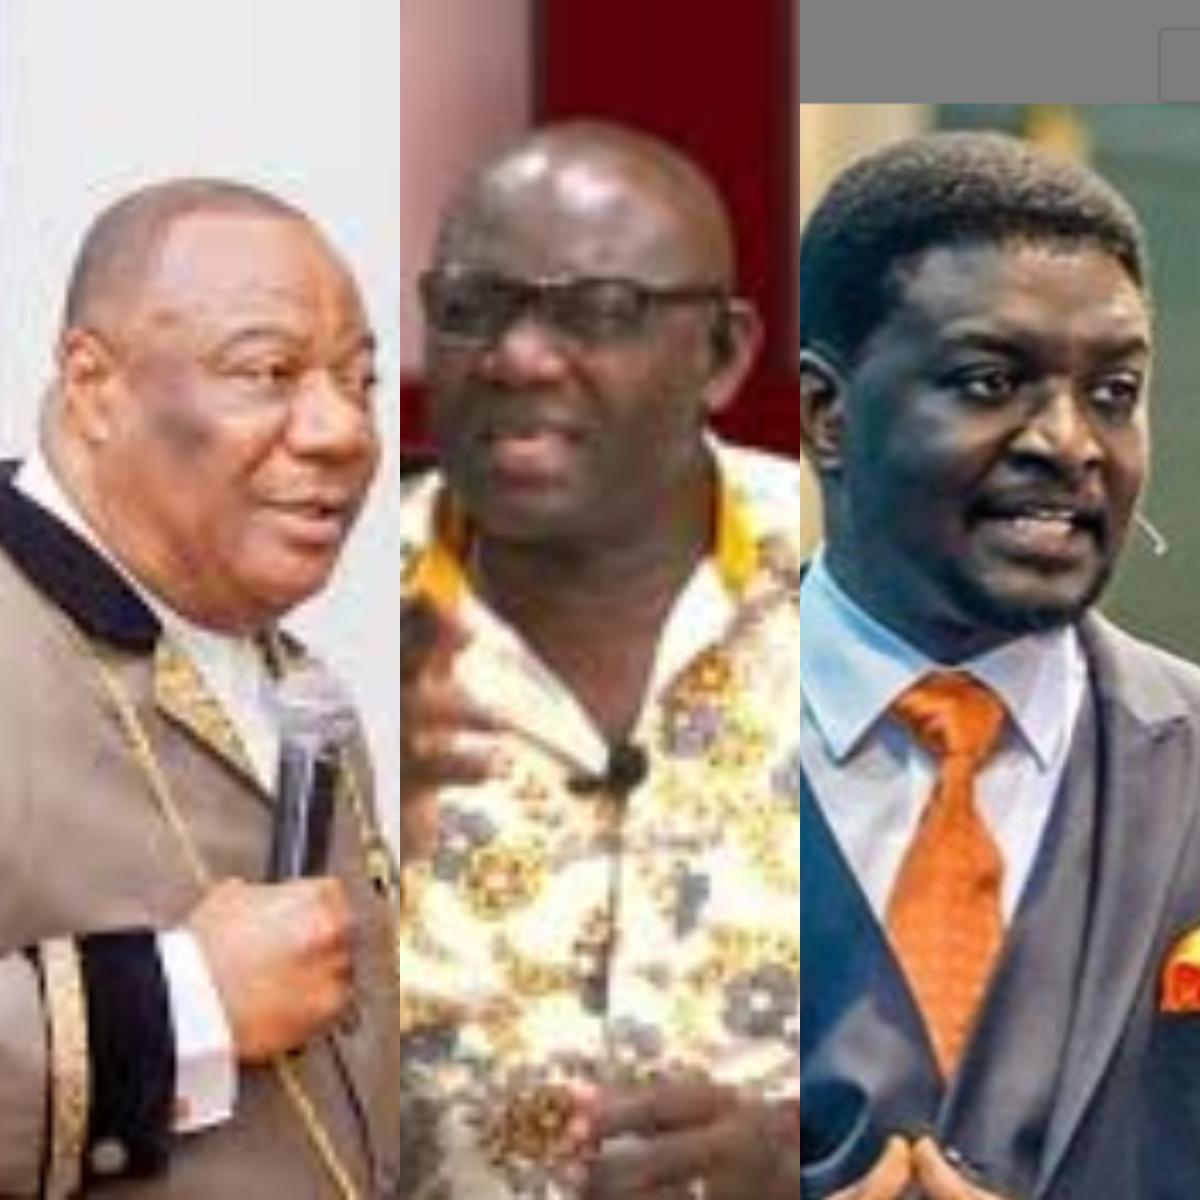 VIDEO: NET 2 TV's Kwaku Annan blasts Archbishop Duncan Williams, Bishop Agyin Asare, Sam Korankye Ankra and others, describes them as evil